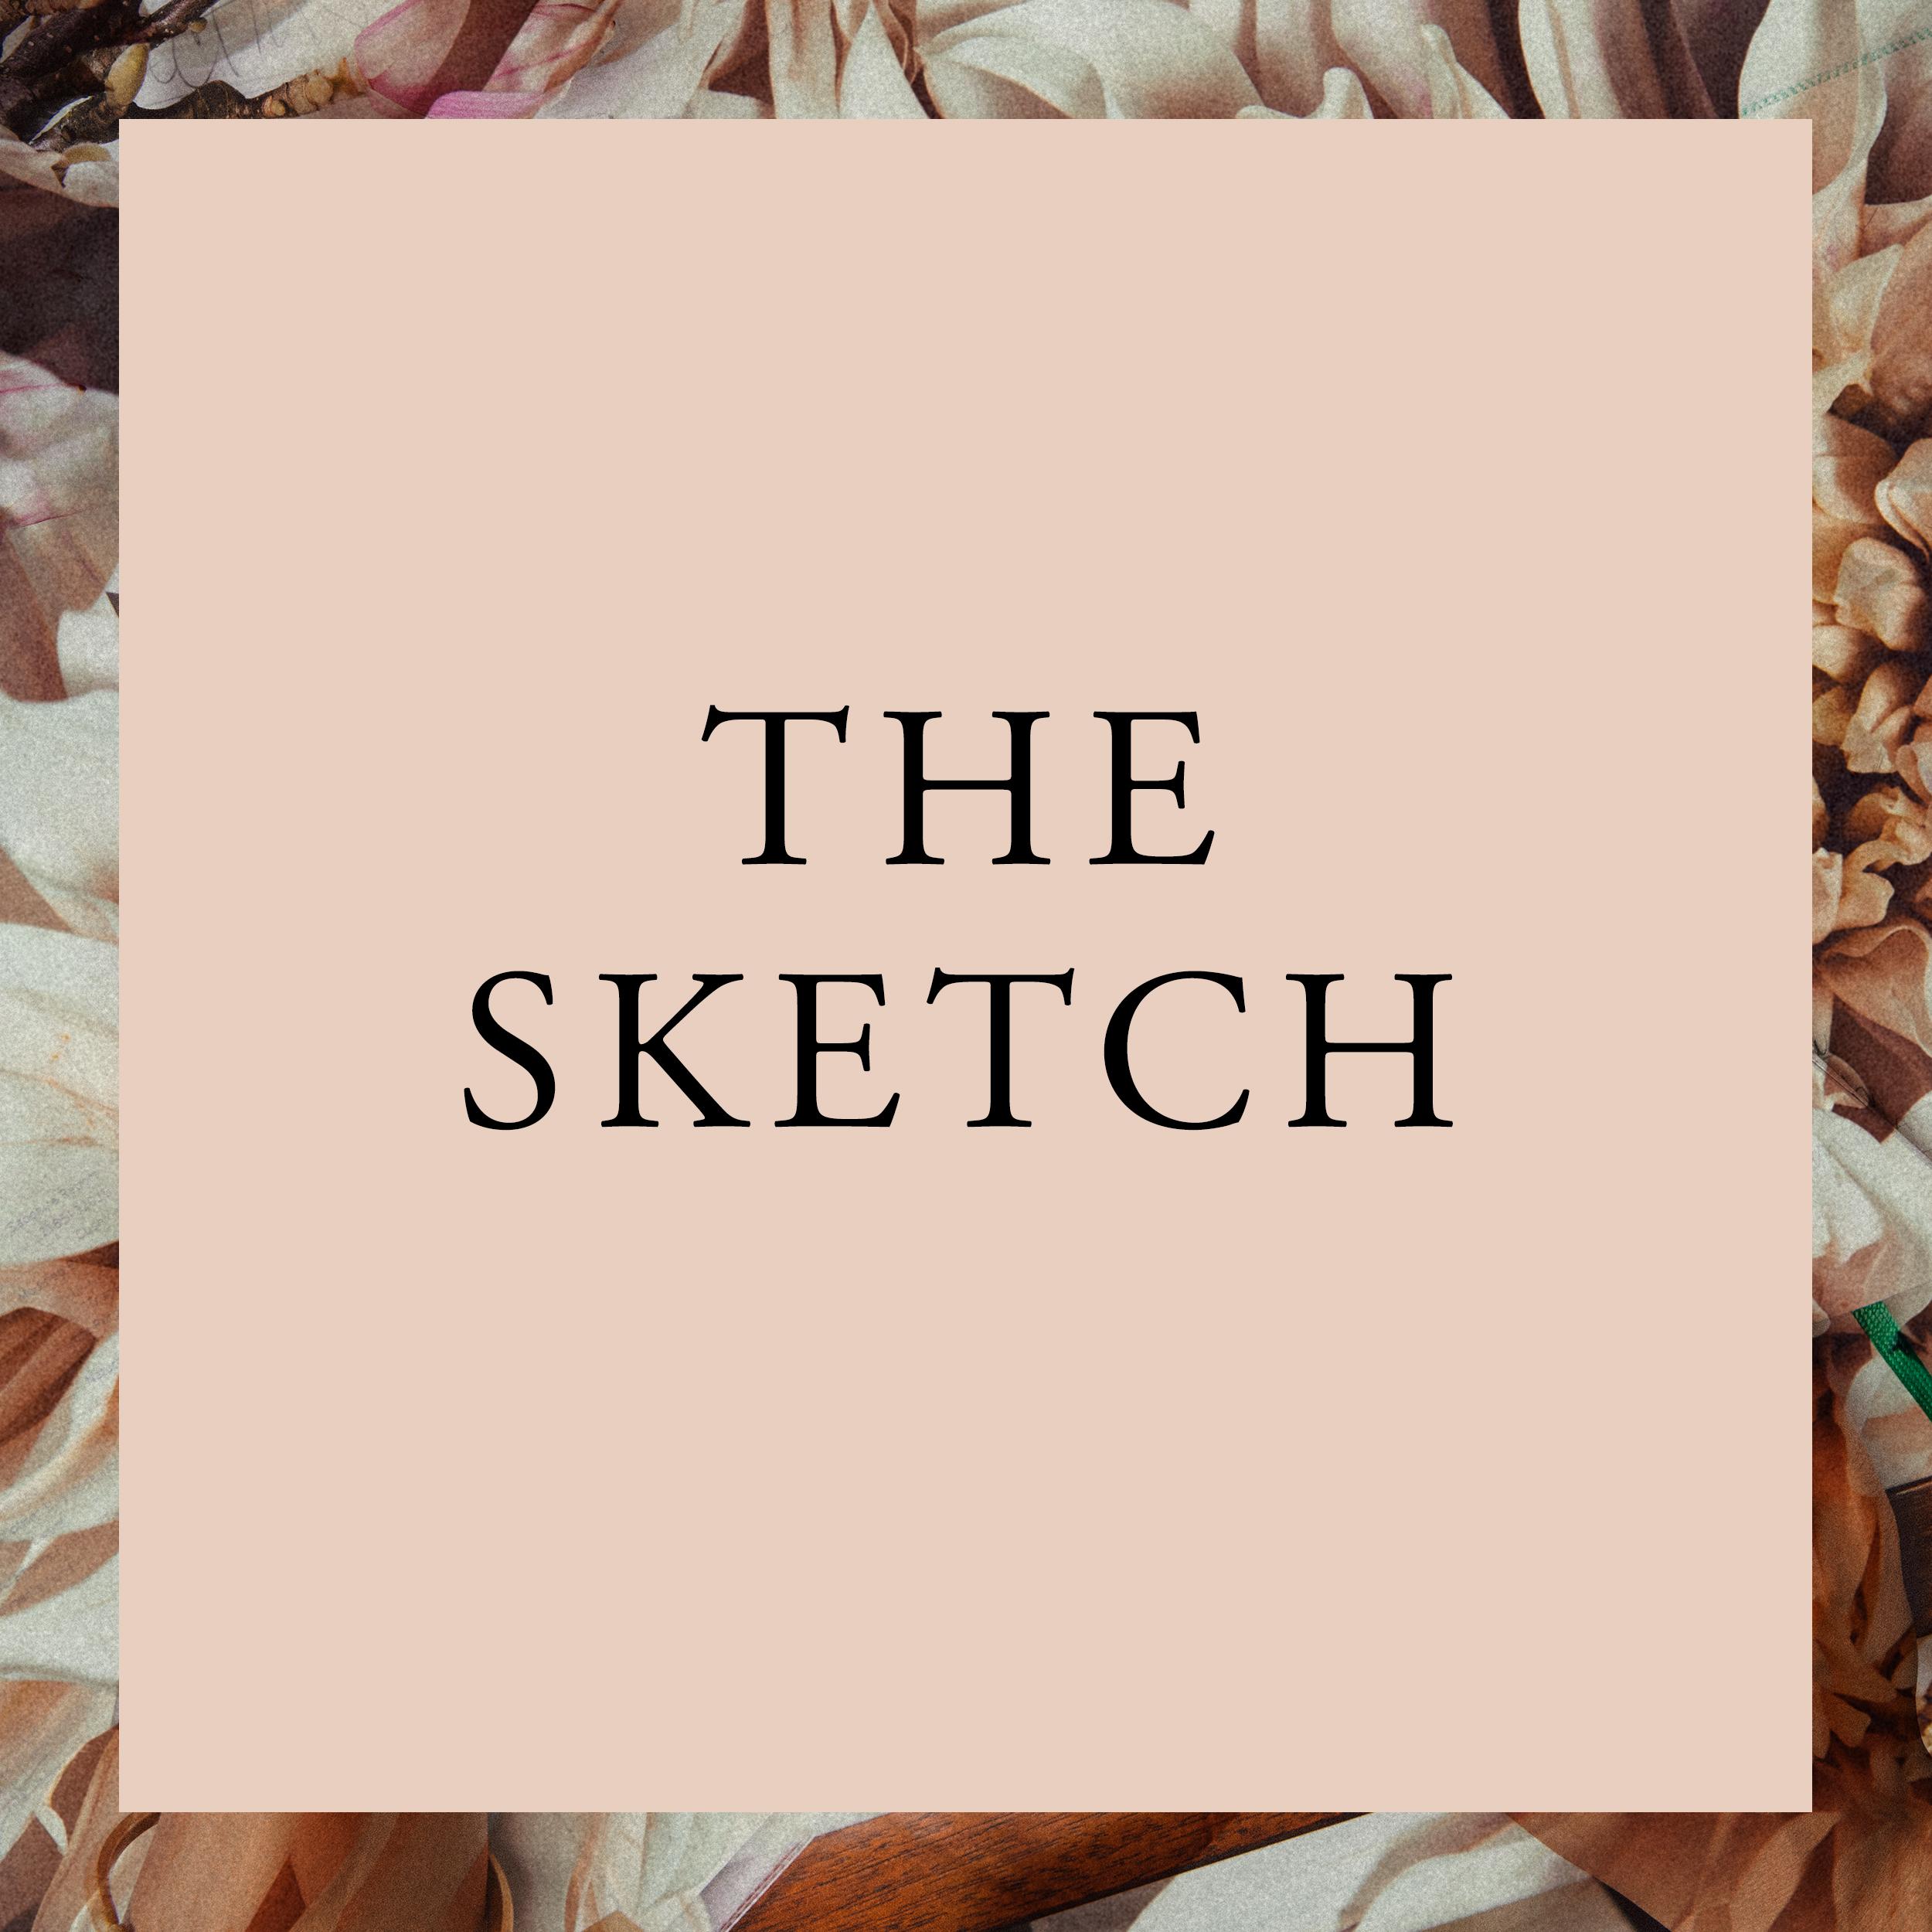 Square_Sketch_Text_2.jpg